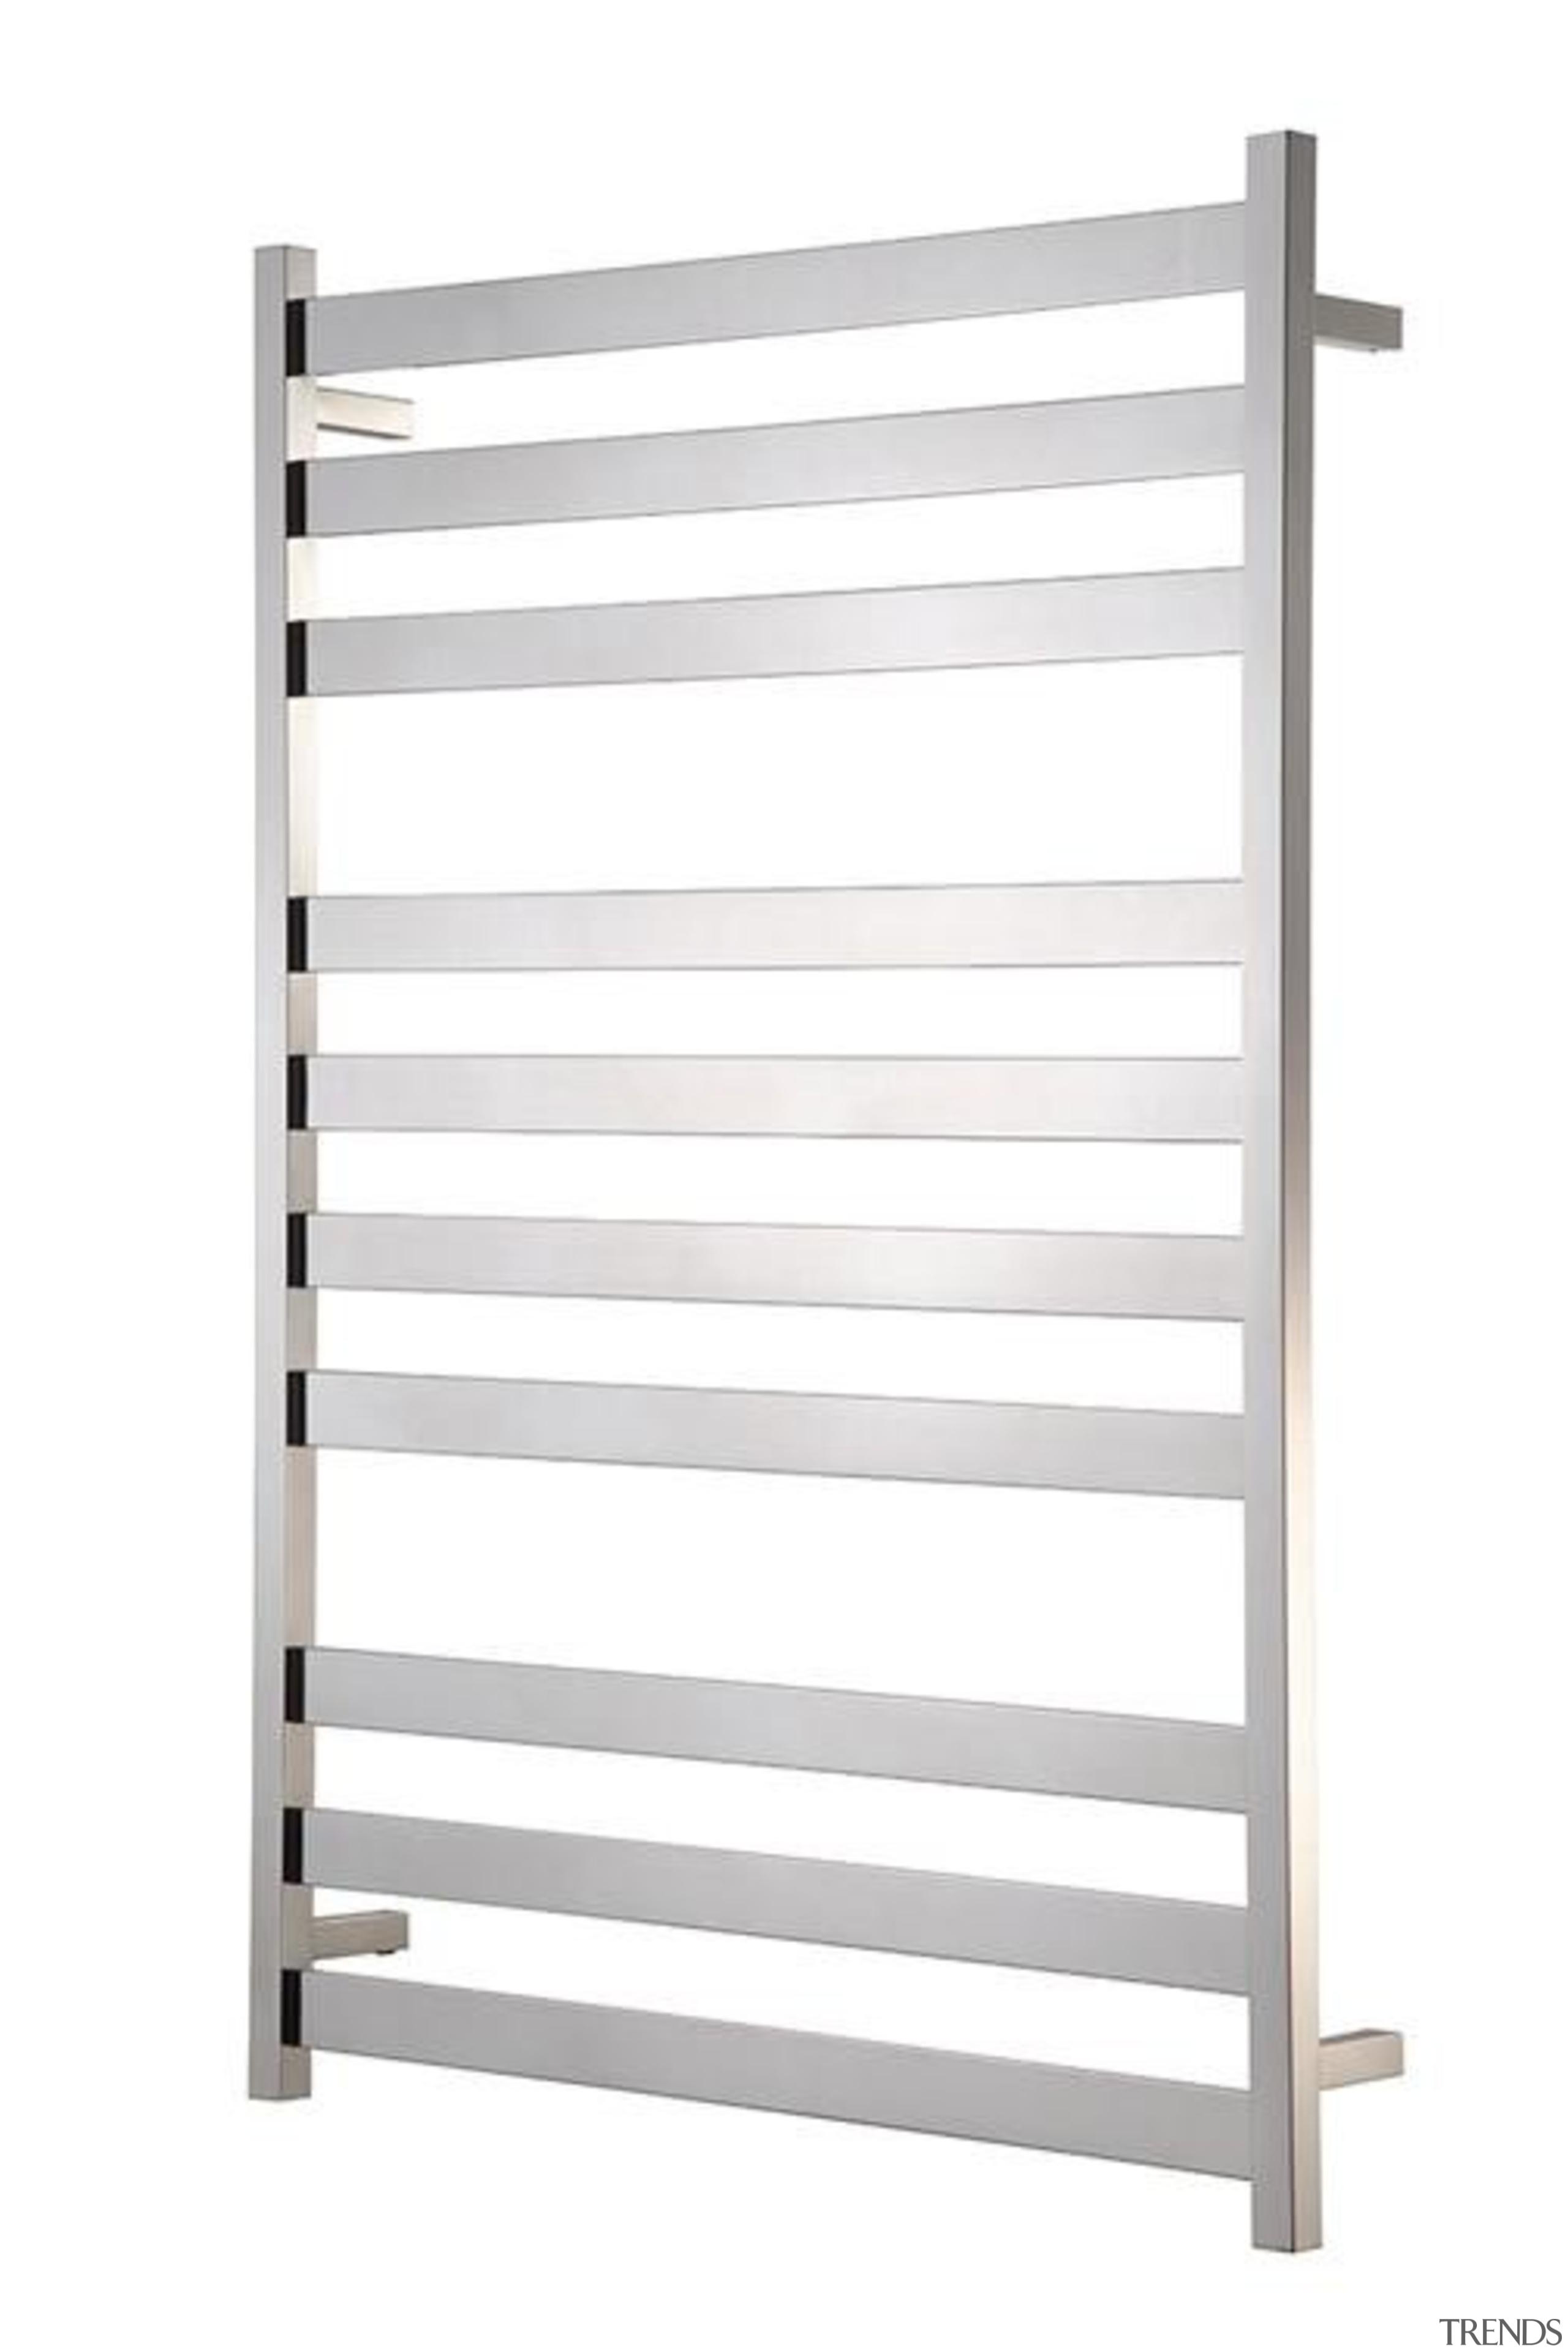 Loft 1220 Extended Towel Warmer - Loft 1220 line, product, white